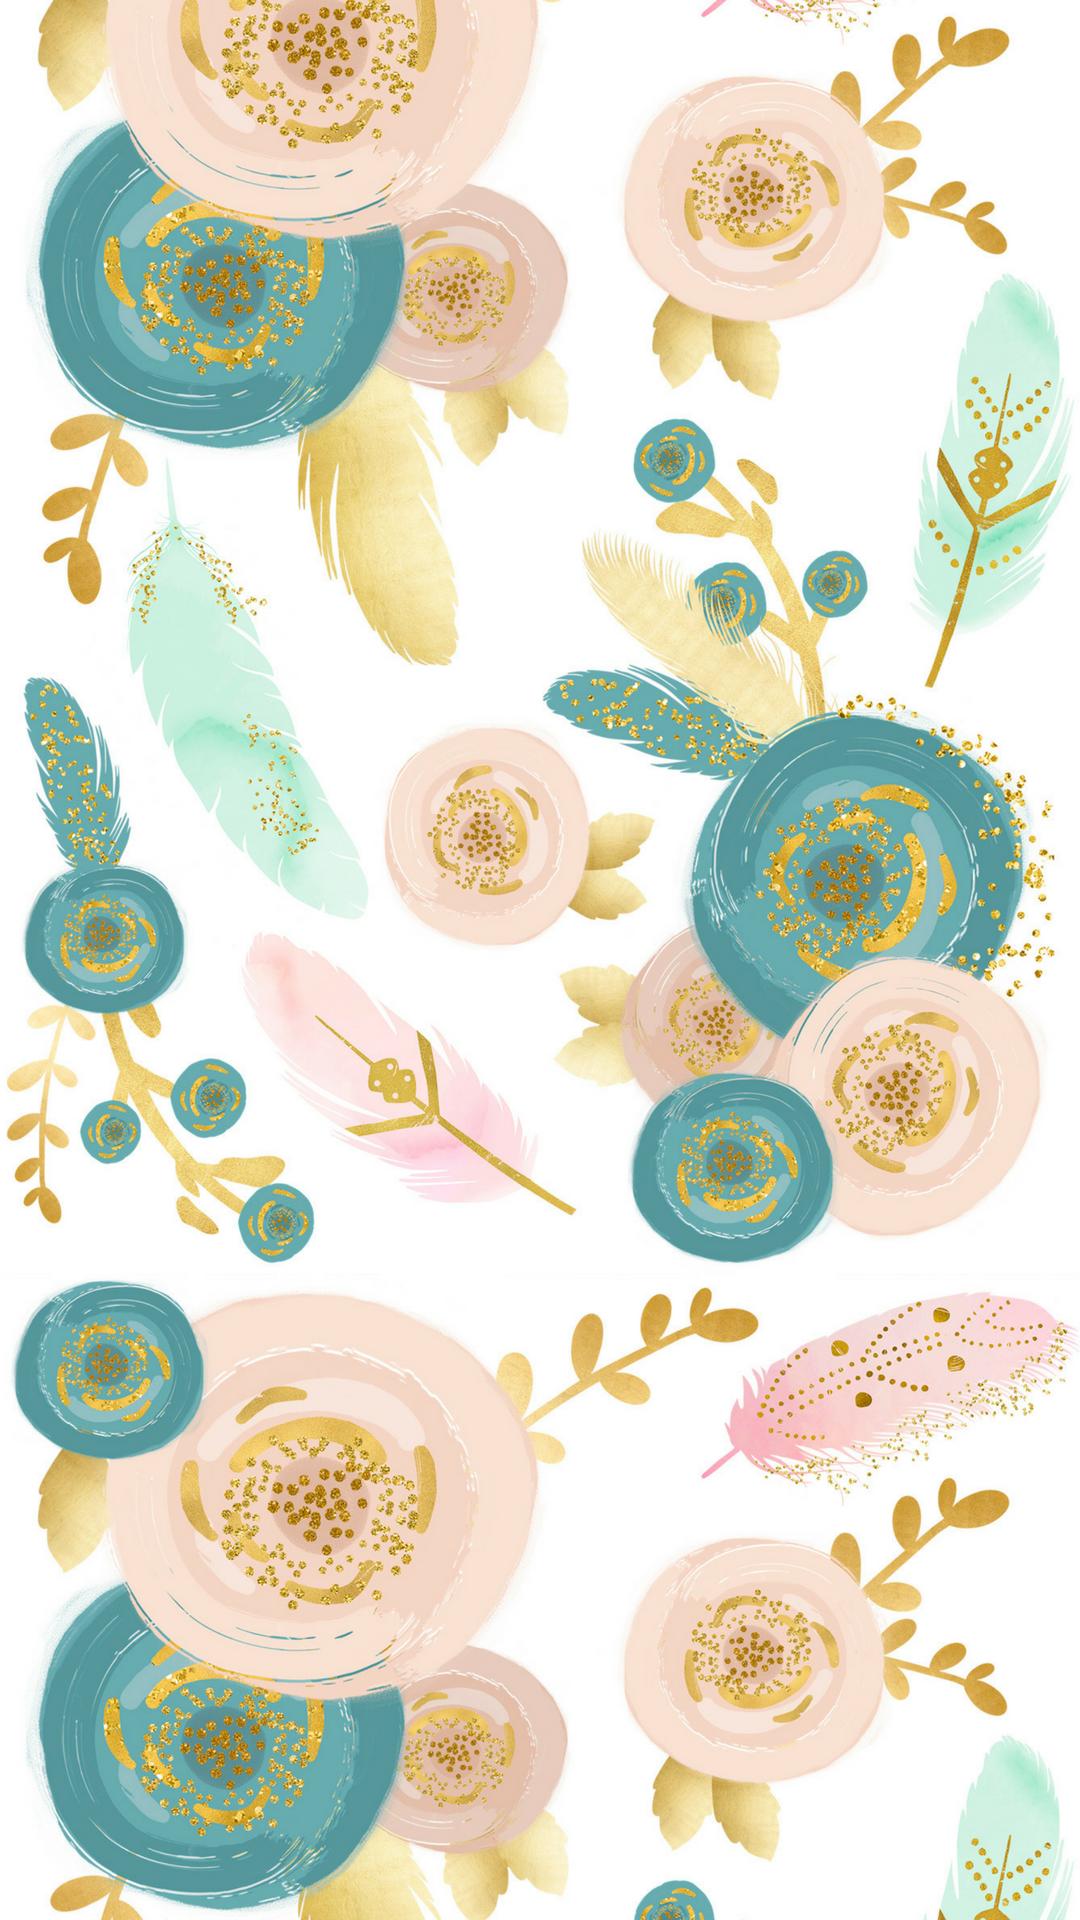 Pin von Conso Cano auf Bonito | Pinterest | Hintergründe, Blume ...